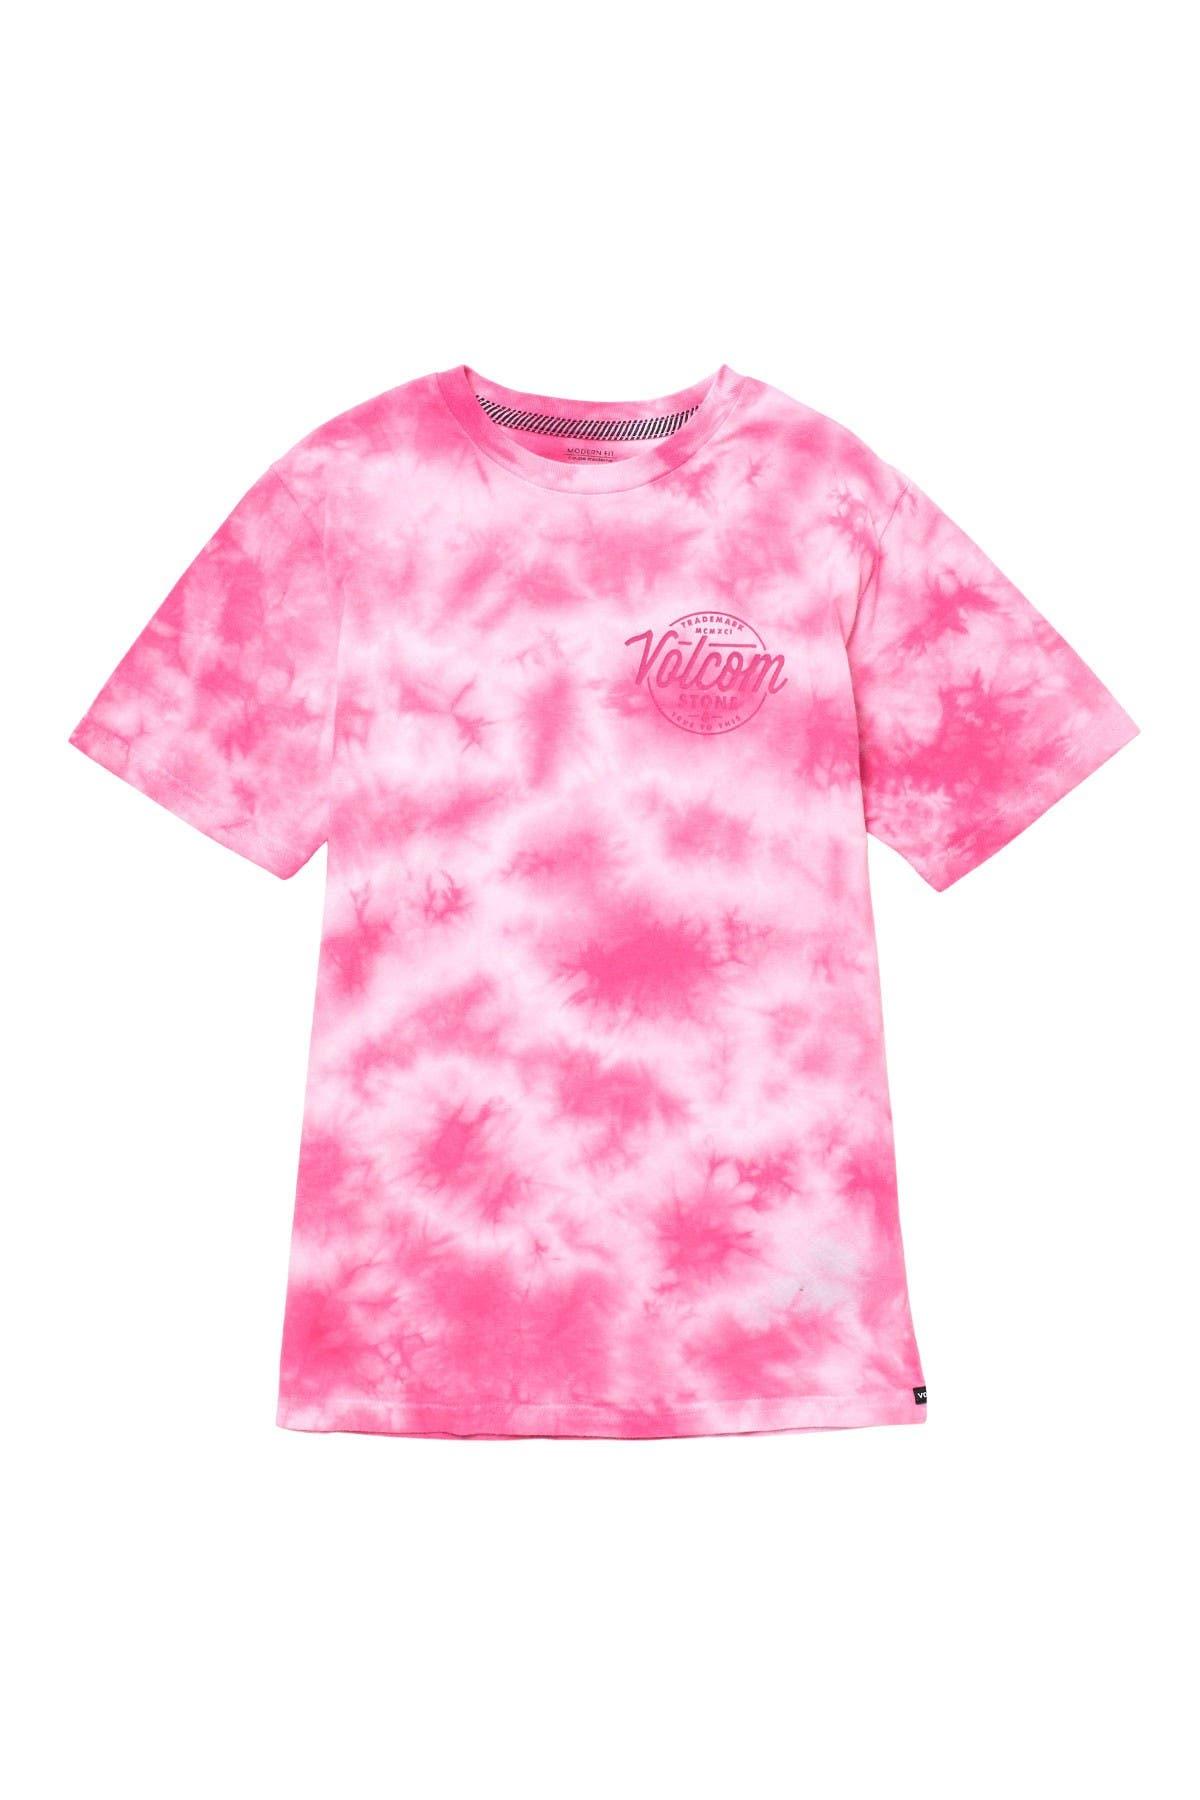 Image of Volcom Disestablish Crew Neck Tie-Dye T-Shirt